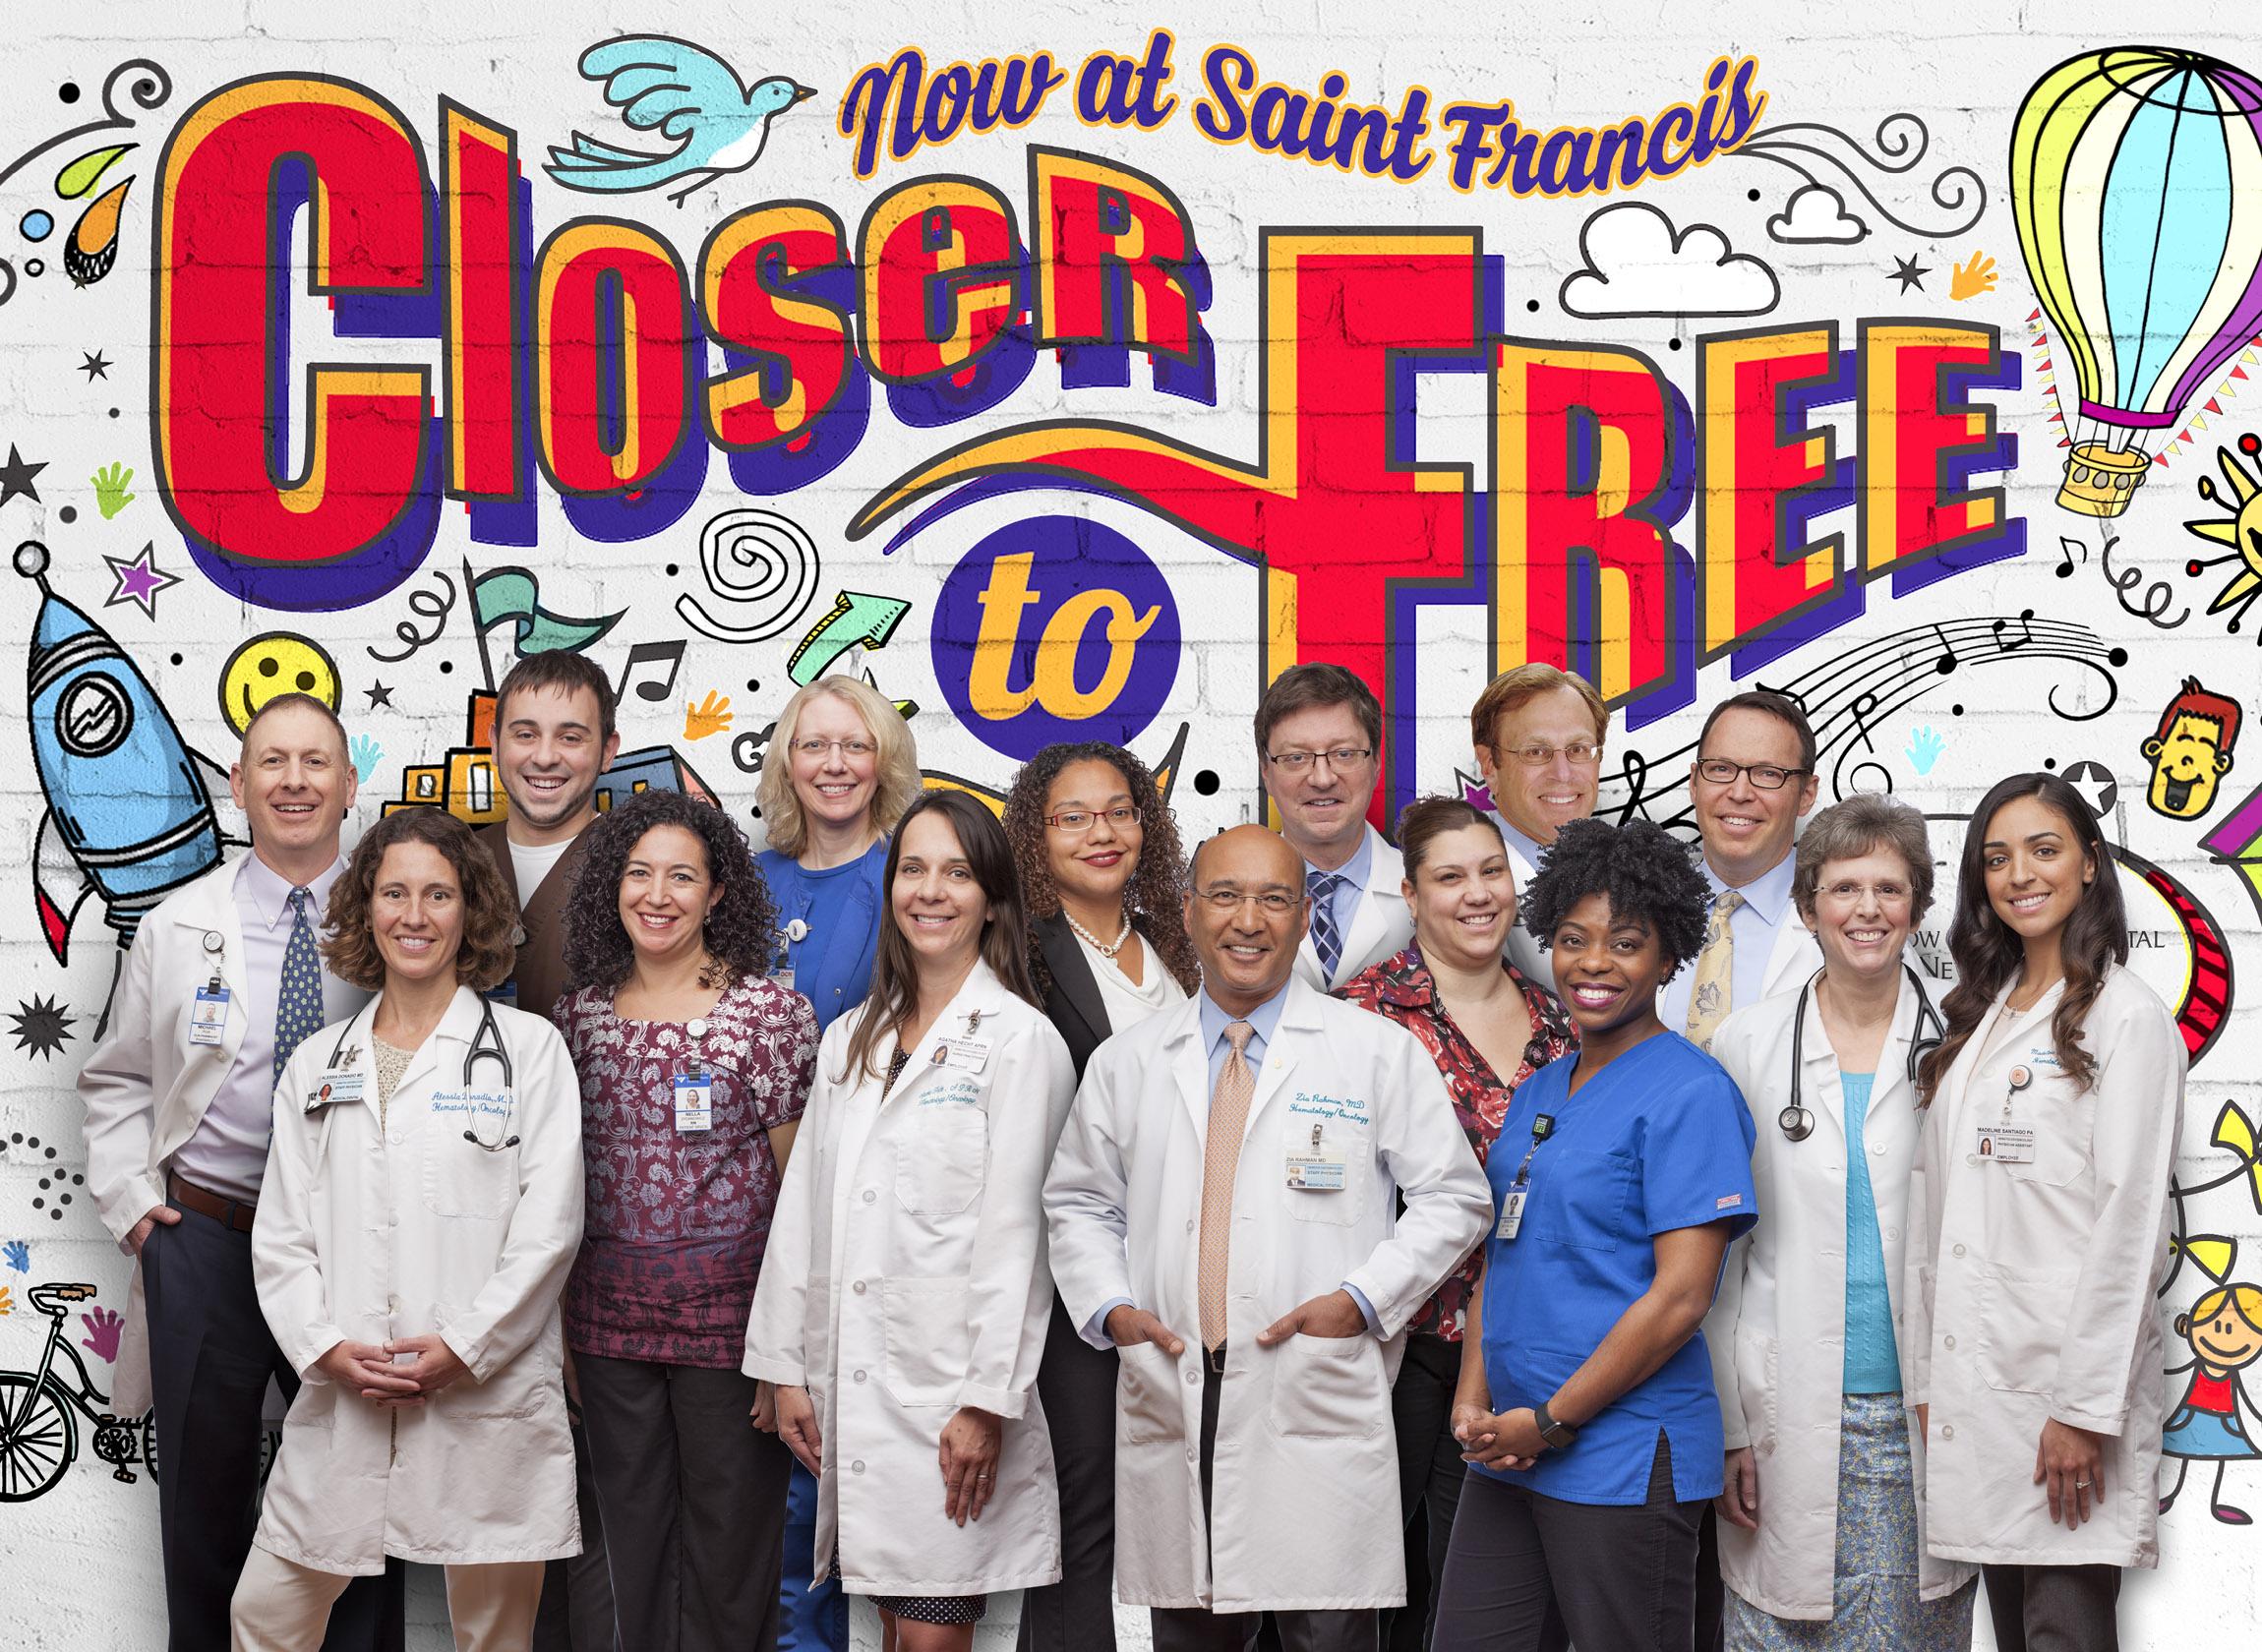 Smilow & St Francis Cancer Doctors, Nurses & Staff - Marketing